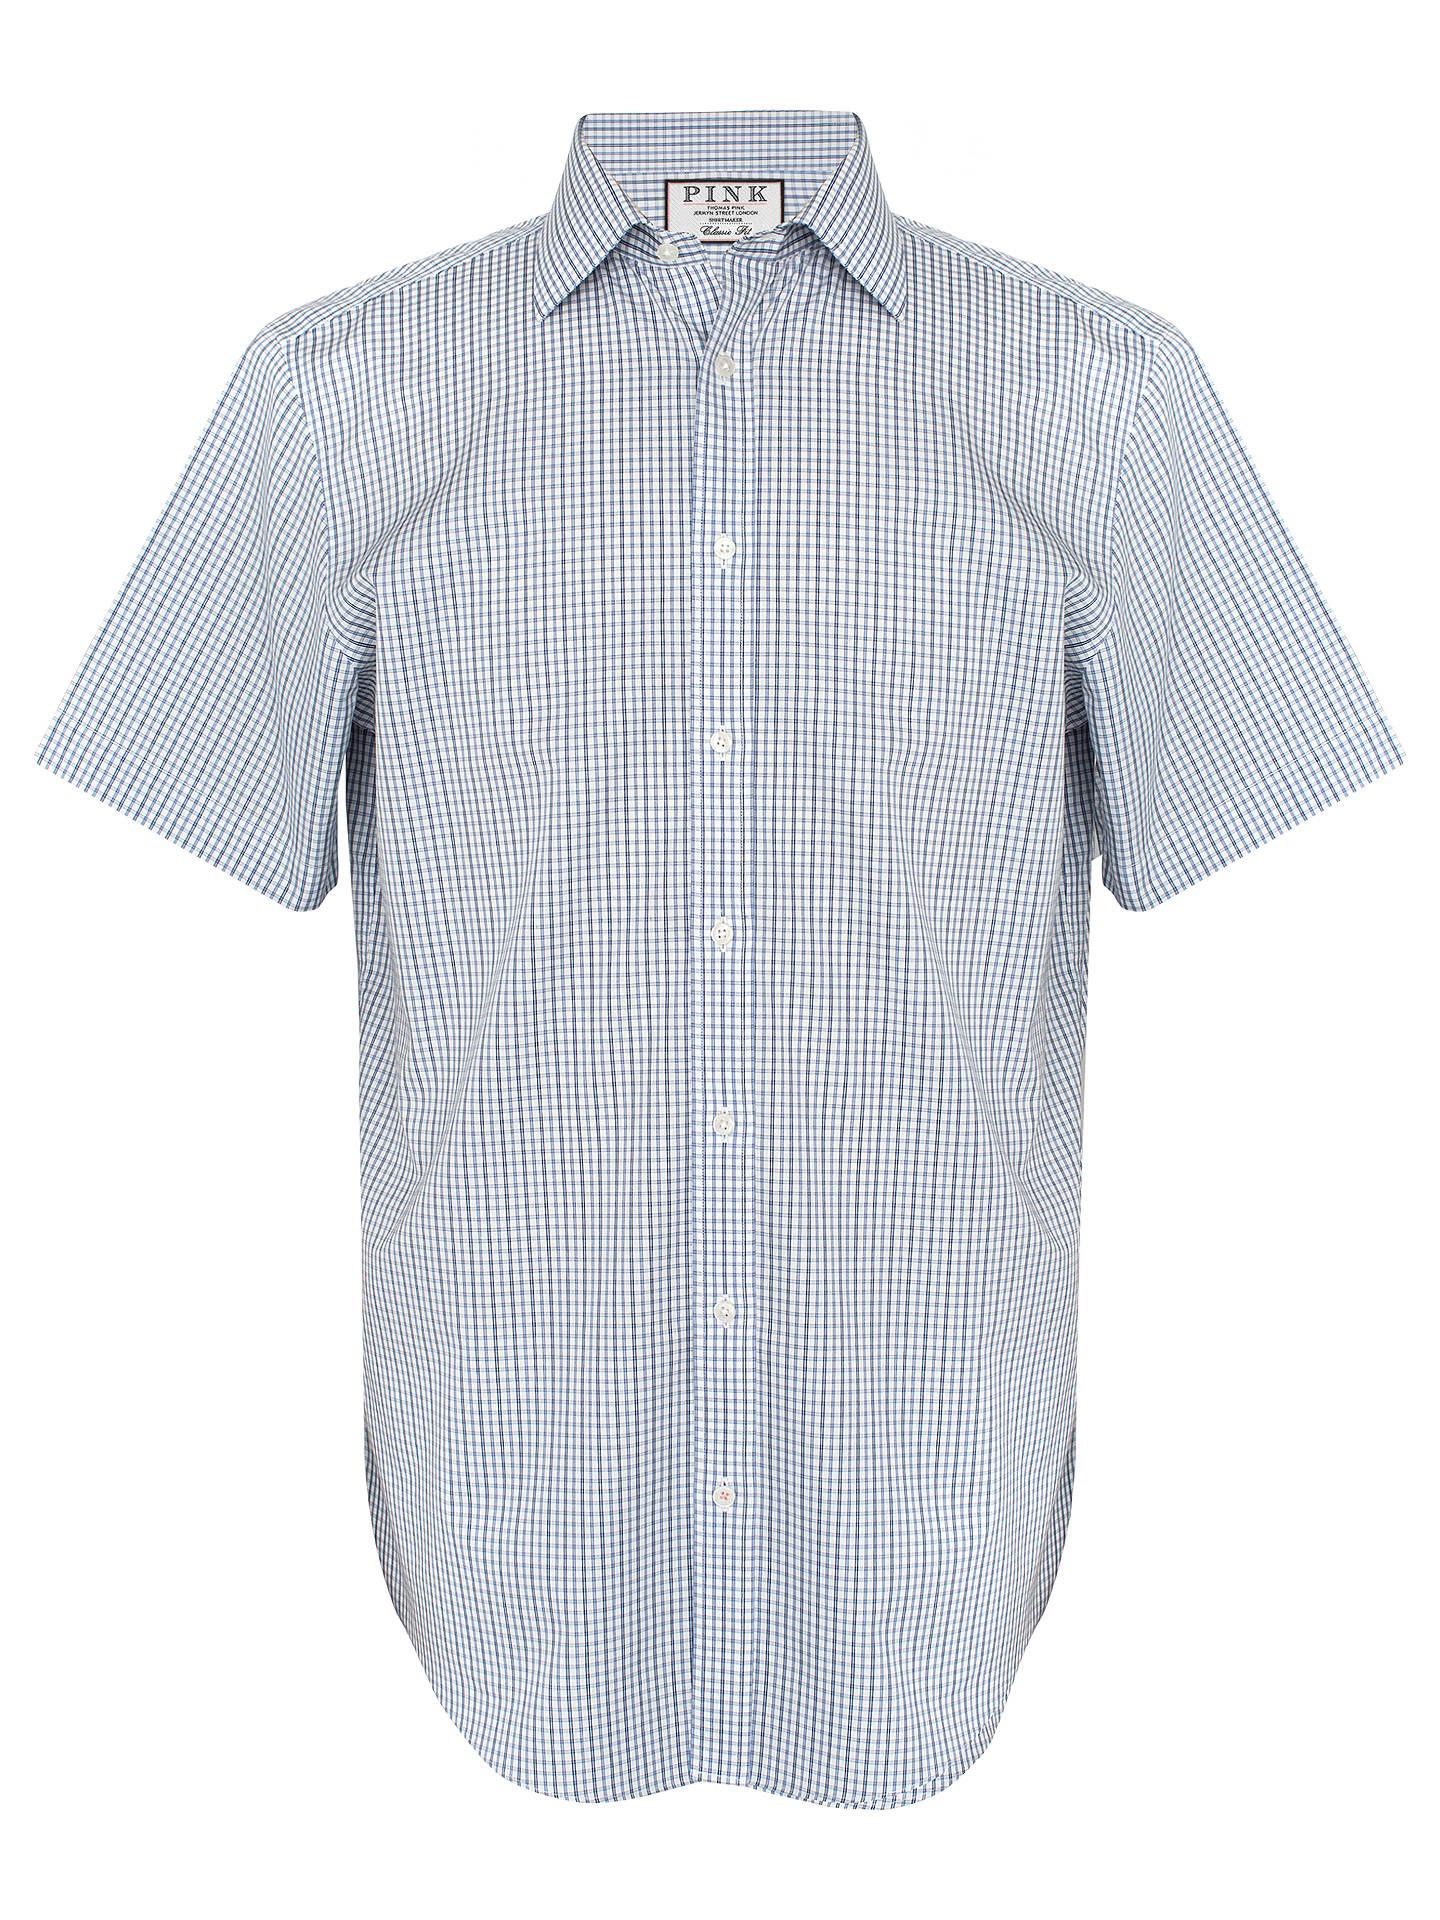 737cbb06 ... Buy Thomas Pink Lipson Check Classic Fit Short Sleeve Shirt, Blue/White,  14.5